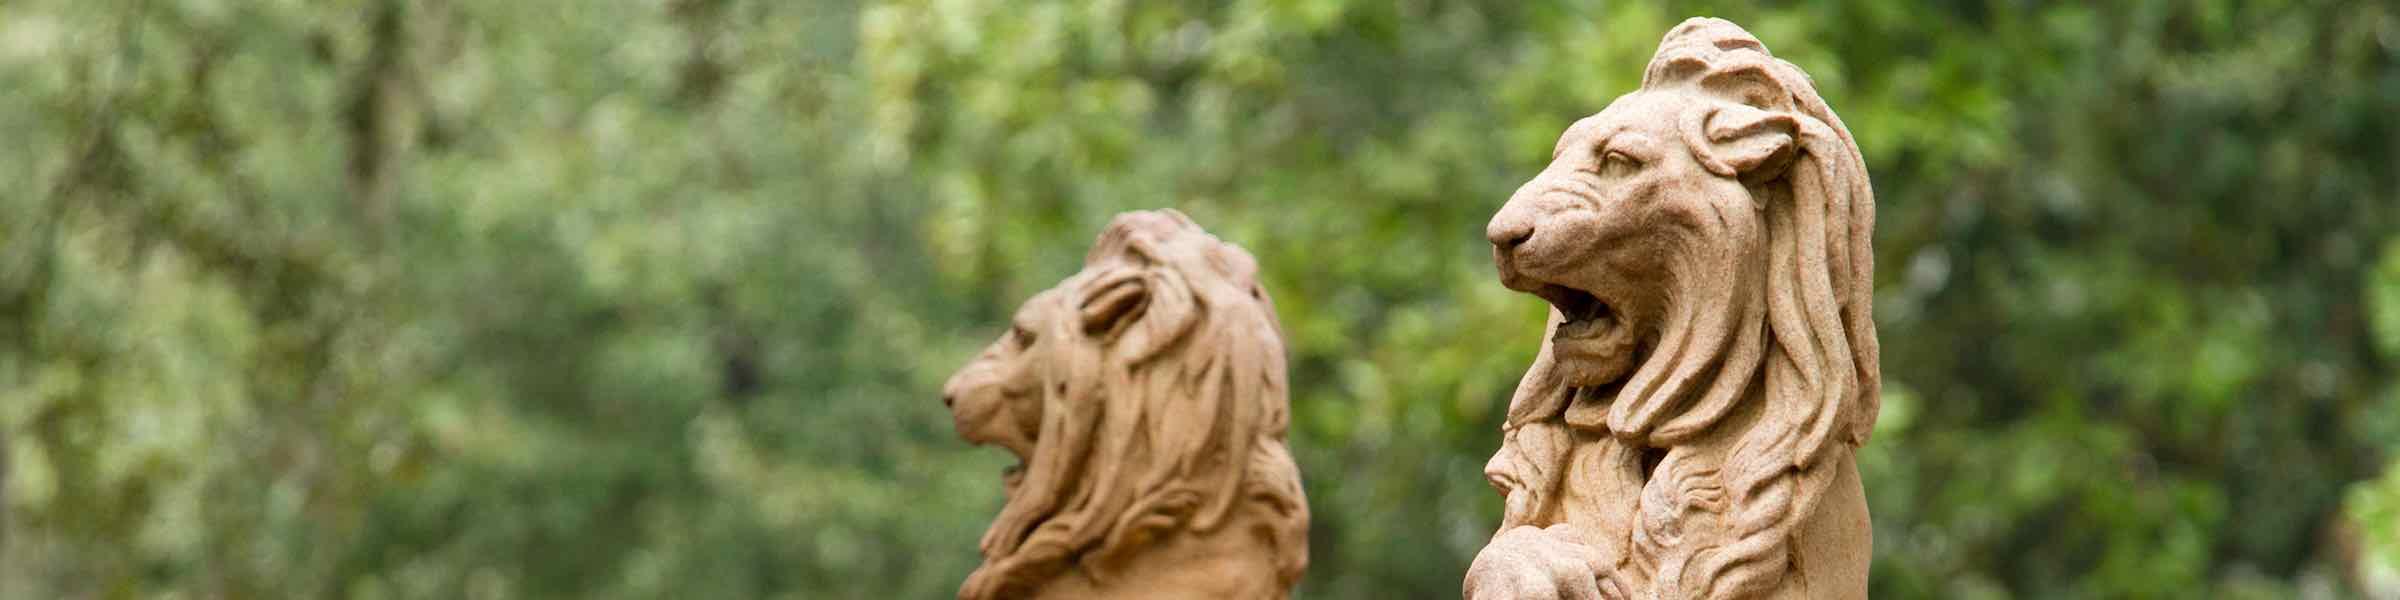 Carved lion figures at the base of the Oglethorpe Monument in Savannah, GA.